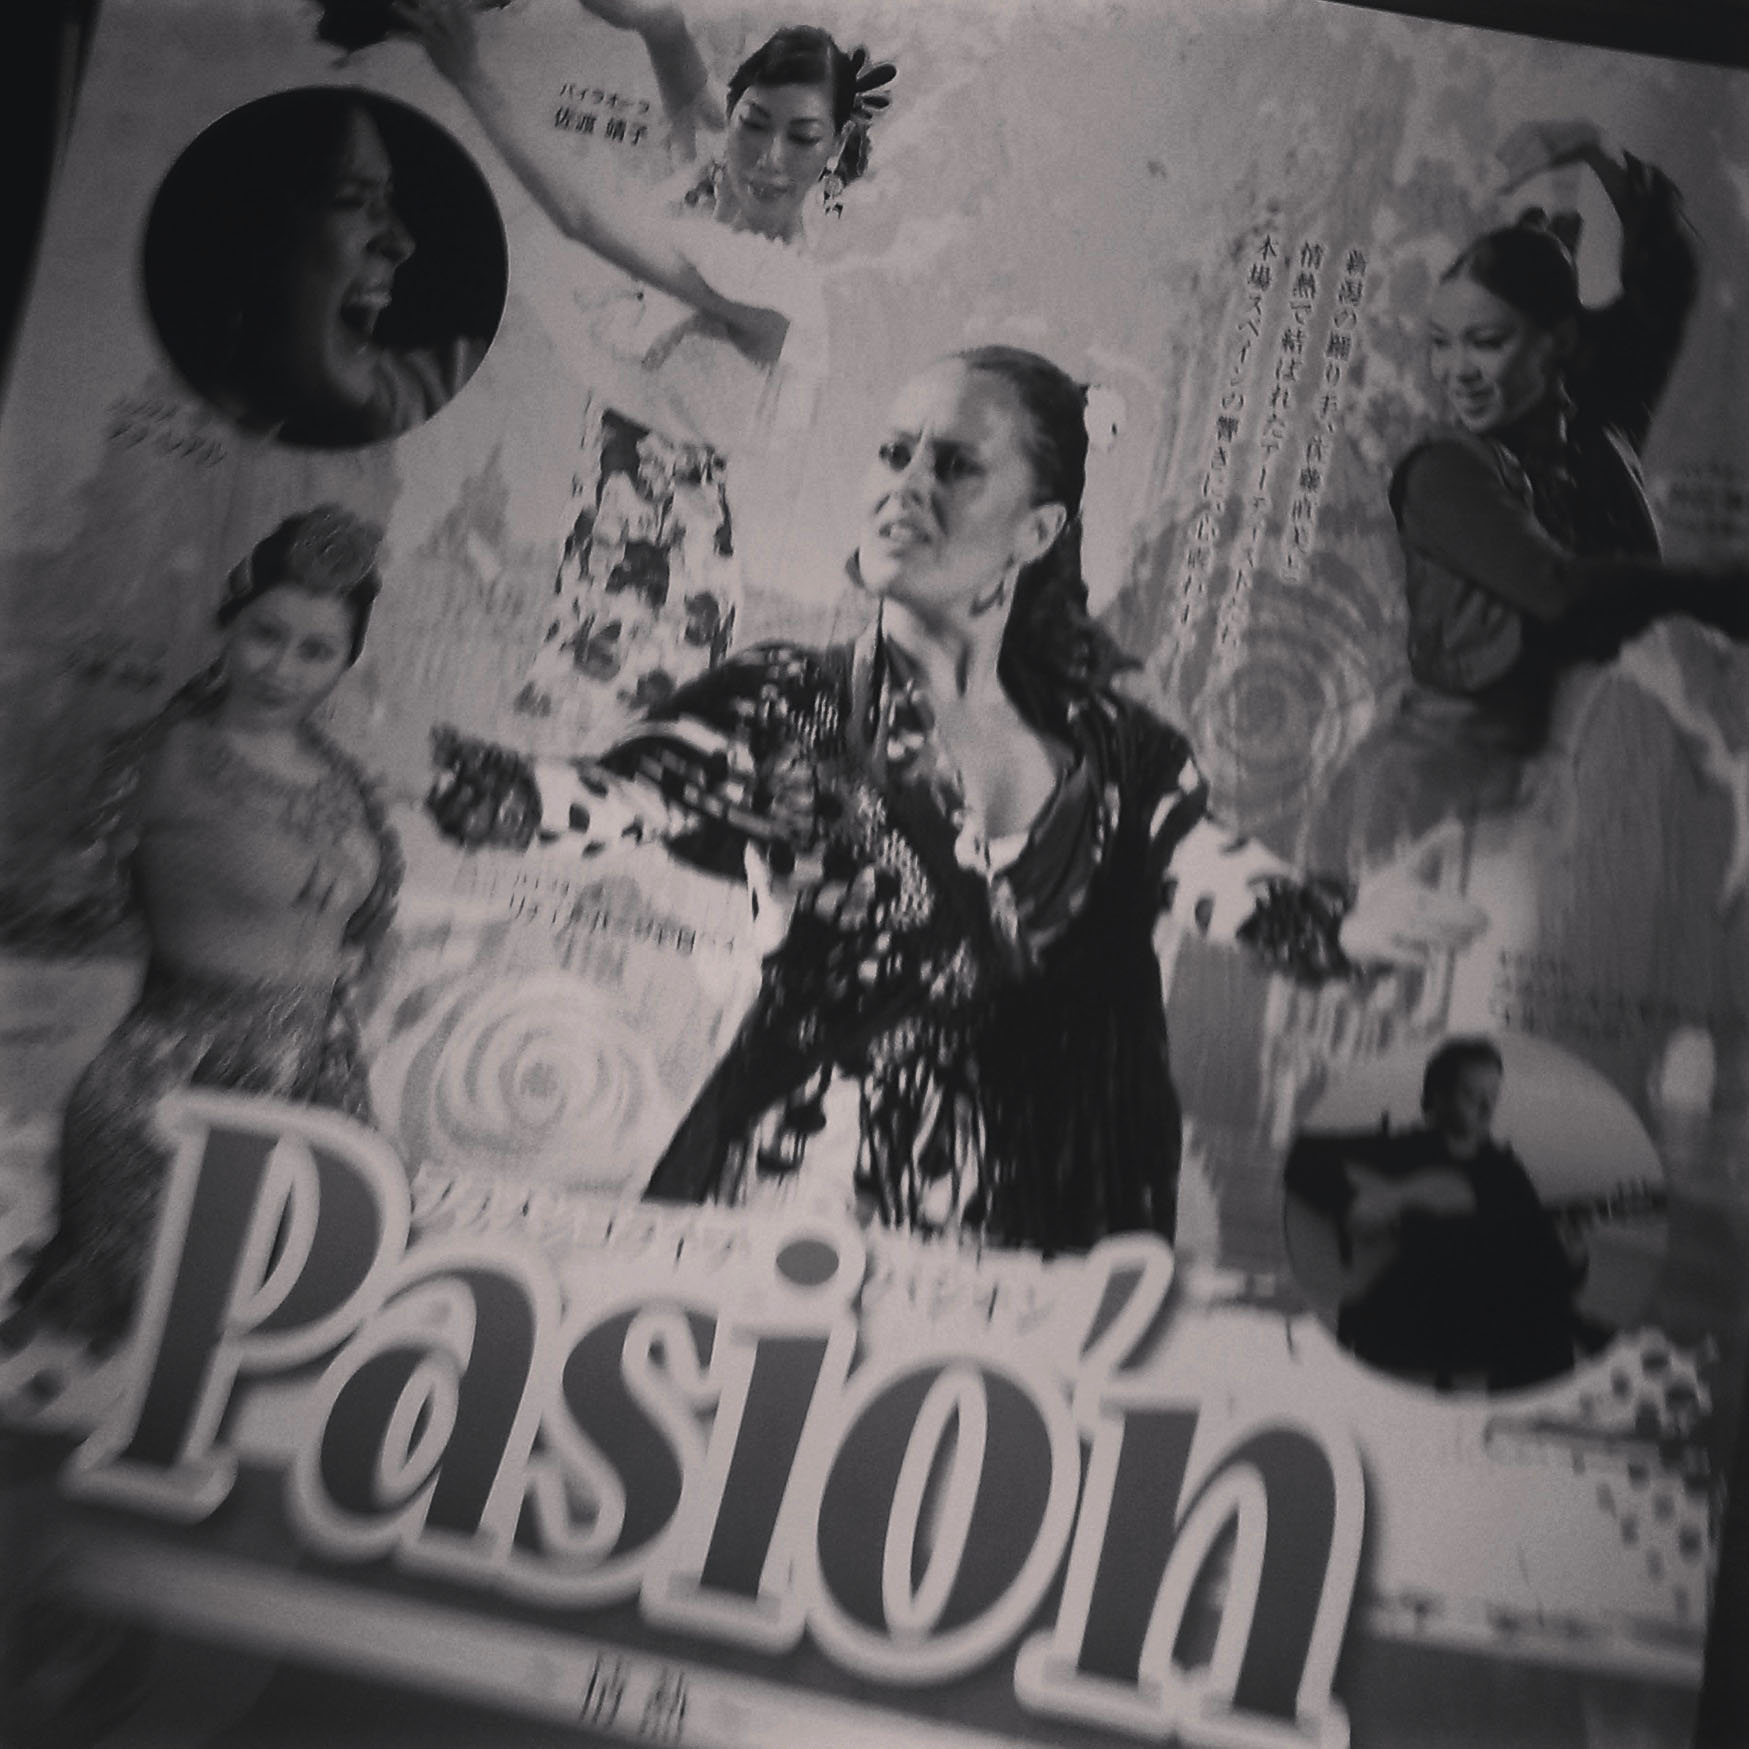 Pasion.jpg